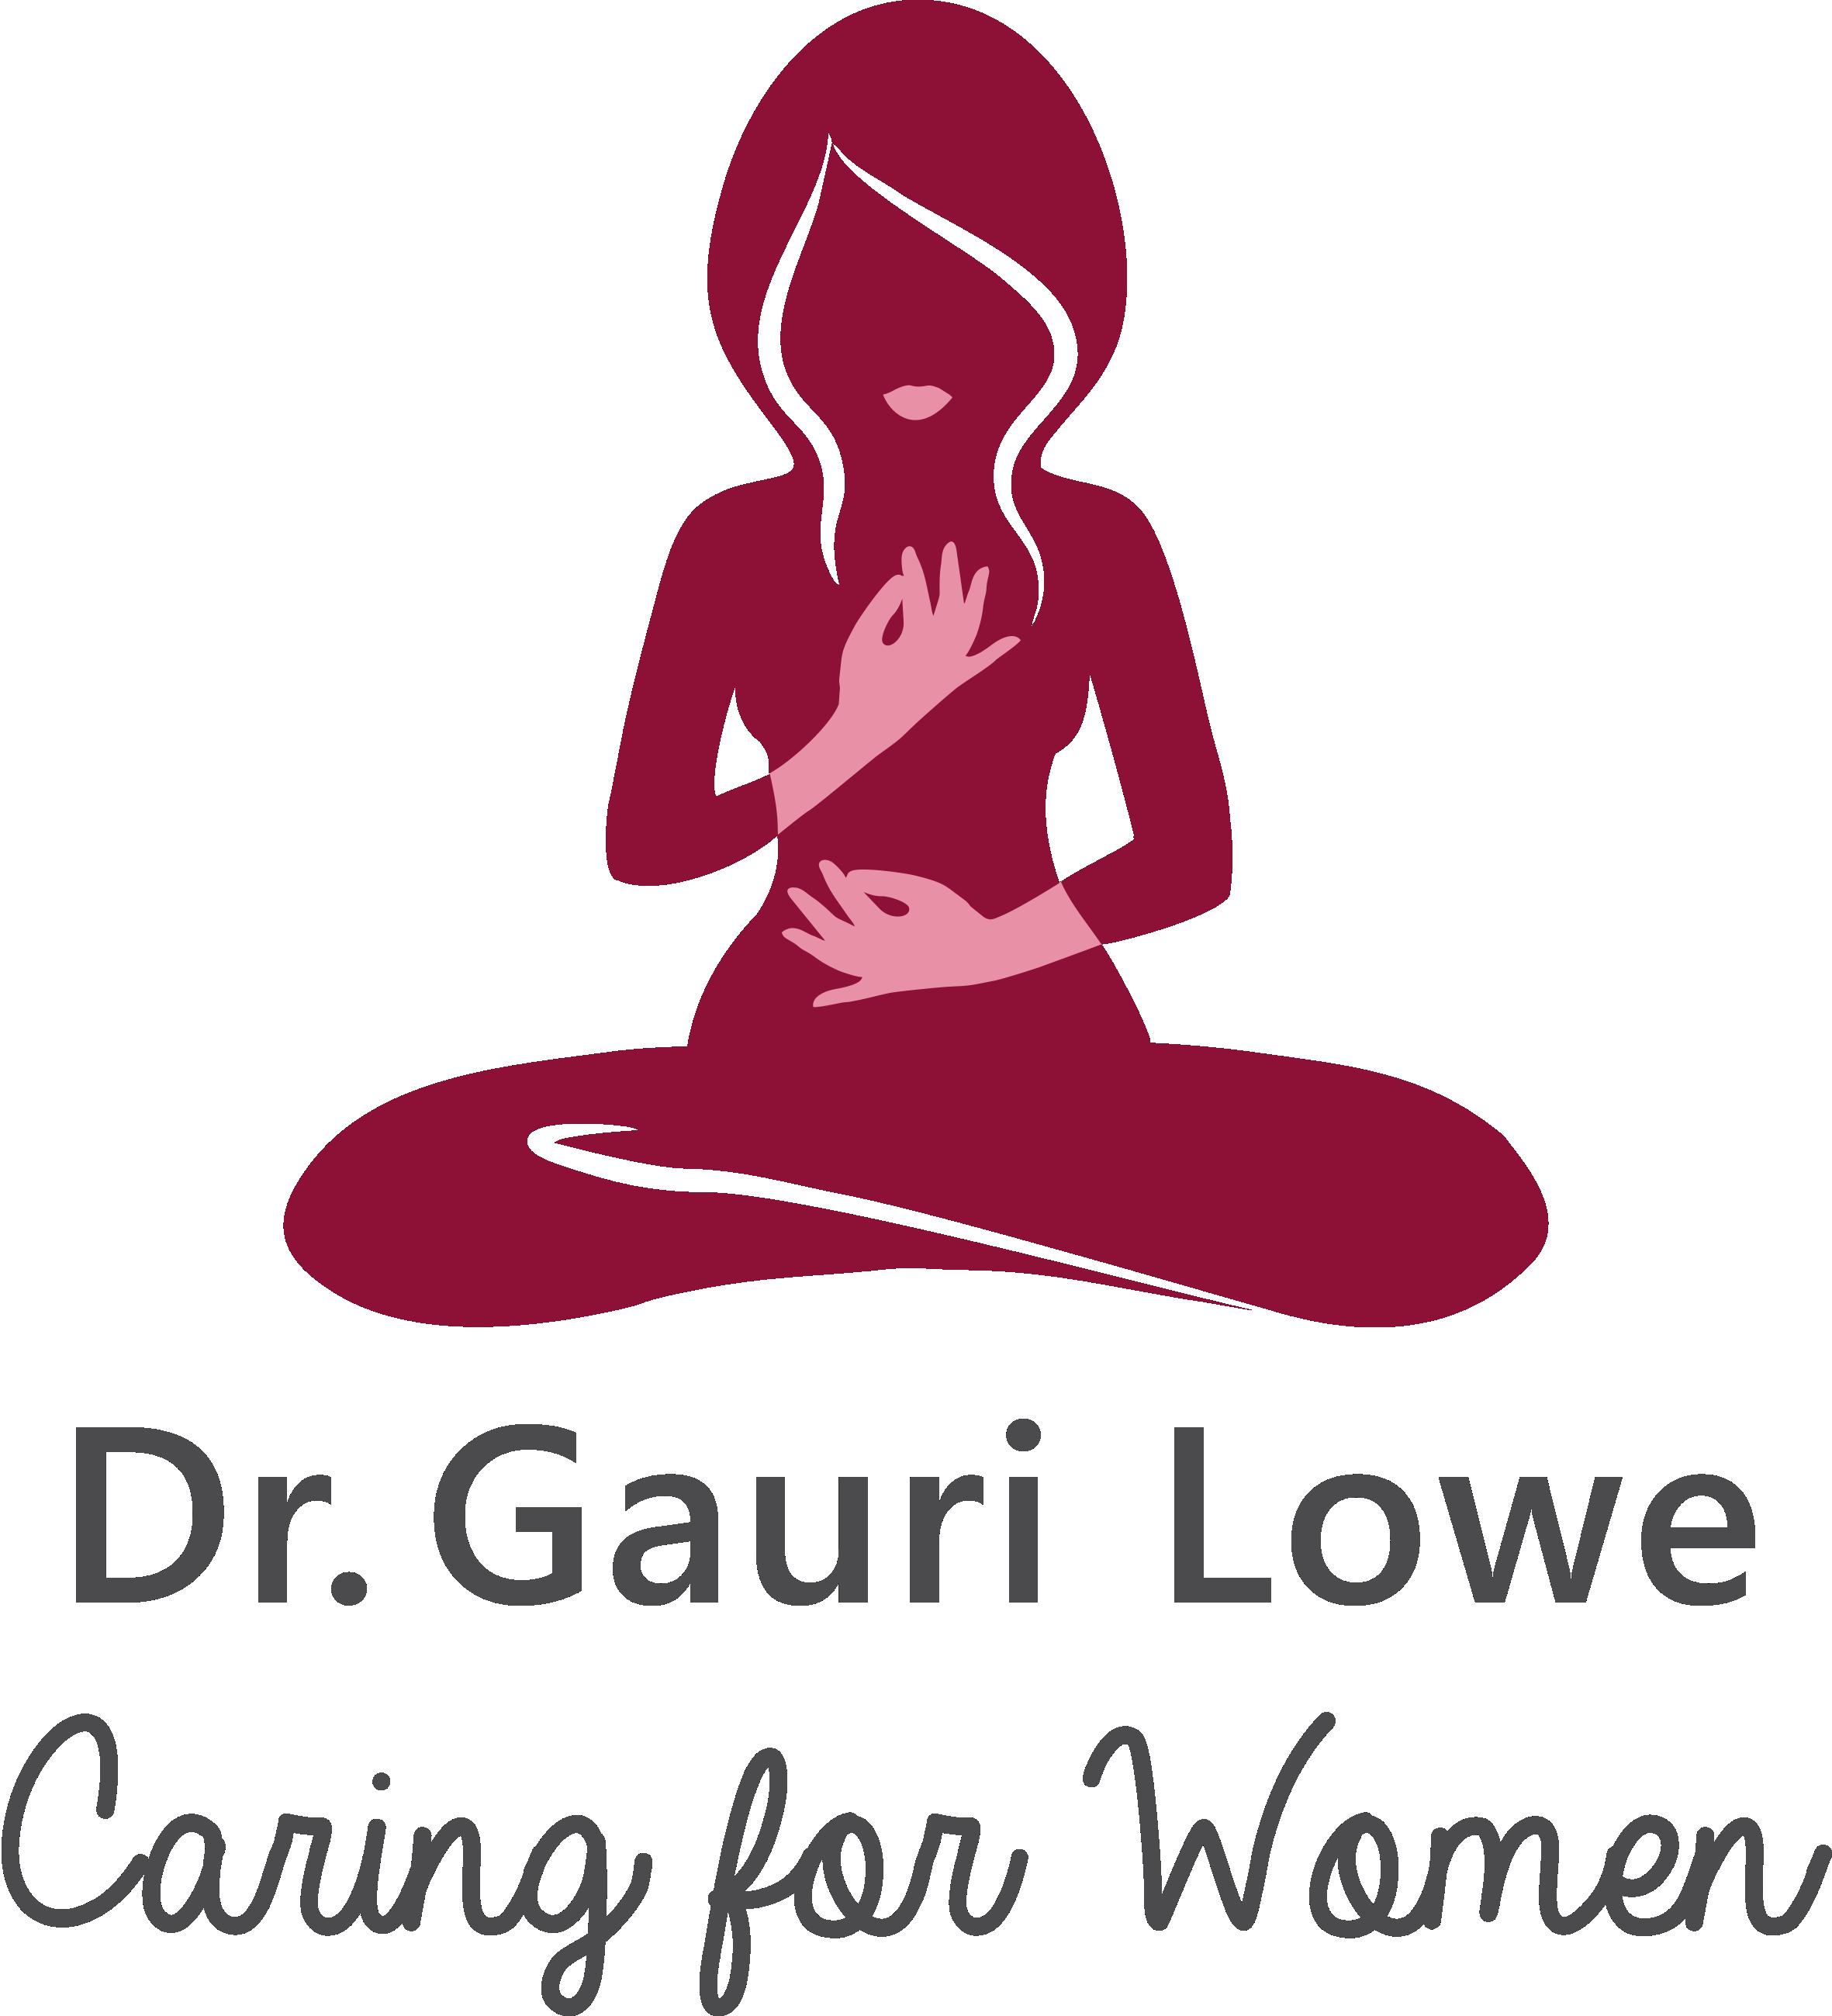 Gauri Lowe logo no background.png